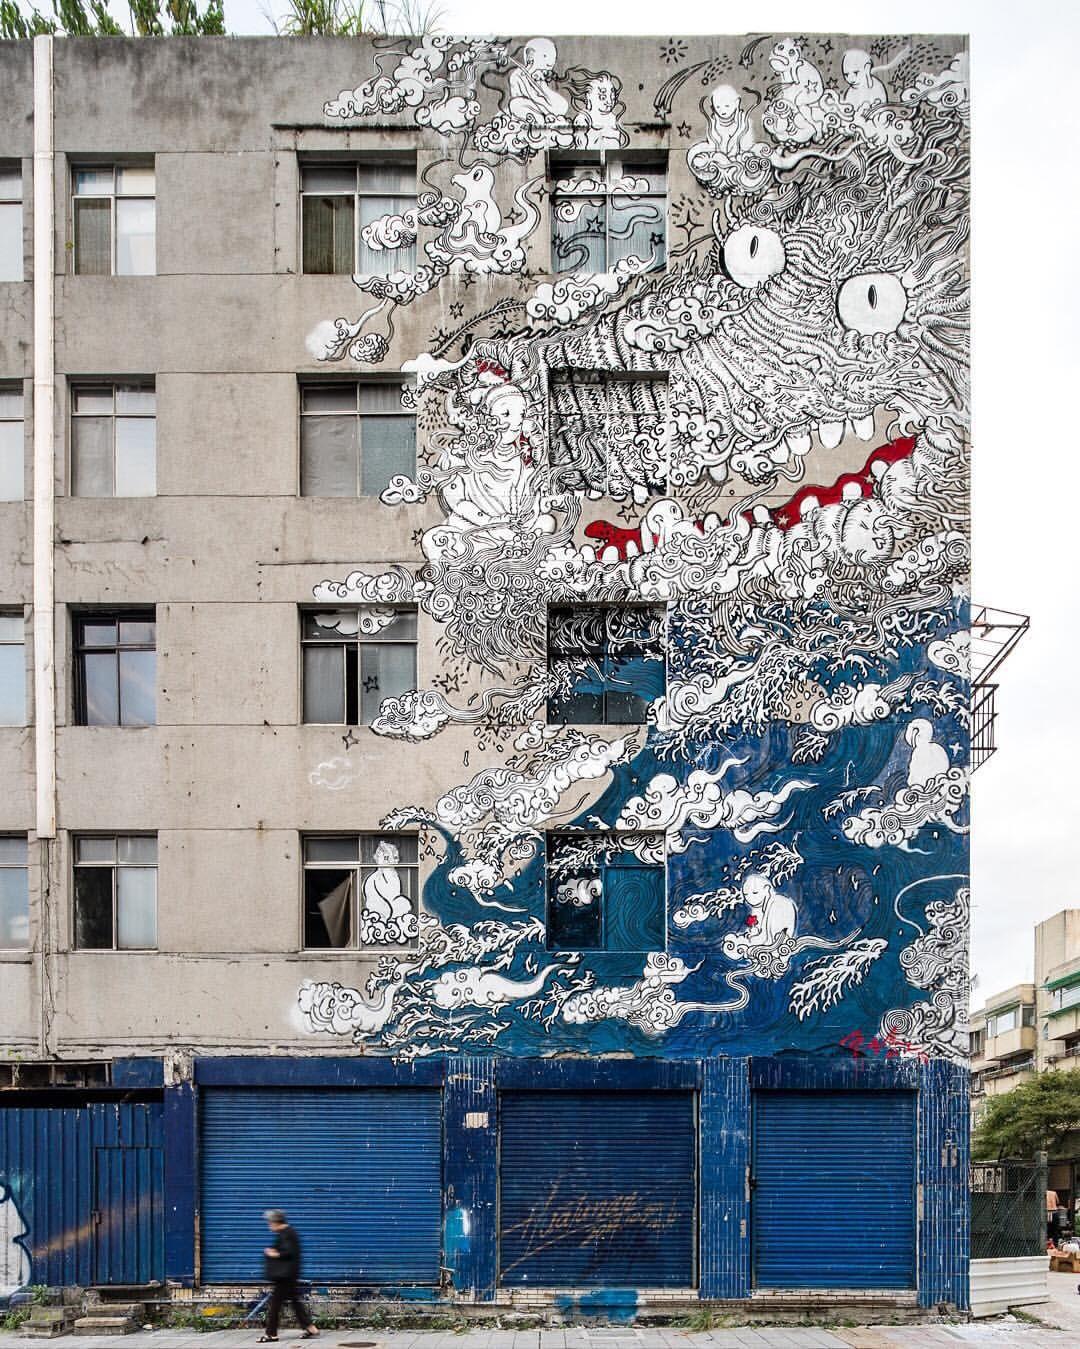 Finished mural by @lveton in Taipei, Taiwan for @powwowtaiwan 2015. // Photo by @bshigeta. ⠀⠀⠀ ⠀ // Supported by @microsoft @rvca @montanacans @flexfit @knockaround #CTBCbank @imperial_taels @imblackbuddha @yogallerytw @stancesocks @travelfoxshoes @visavisjing @chesstaipei #國光客運 @taihubrewing @framed @imprintlab // #powwowworldwide #powwowtaiwan #dogreatthings #streetart